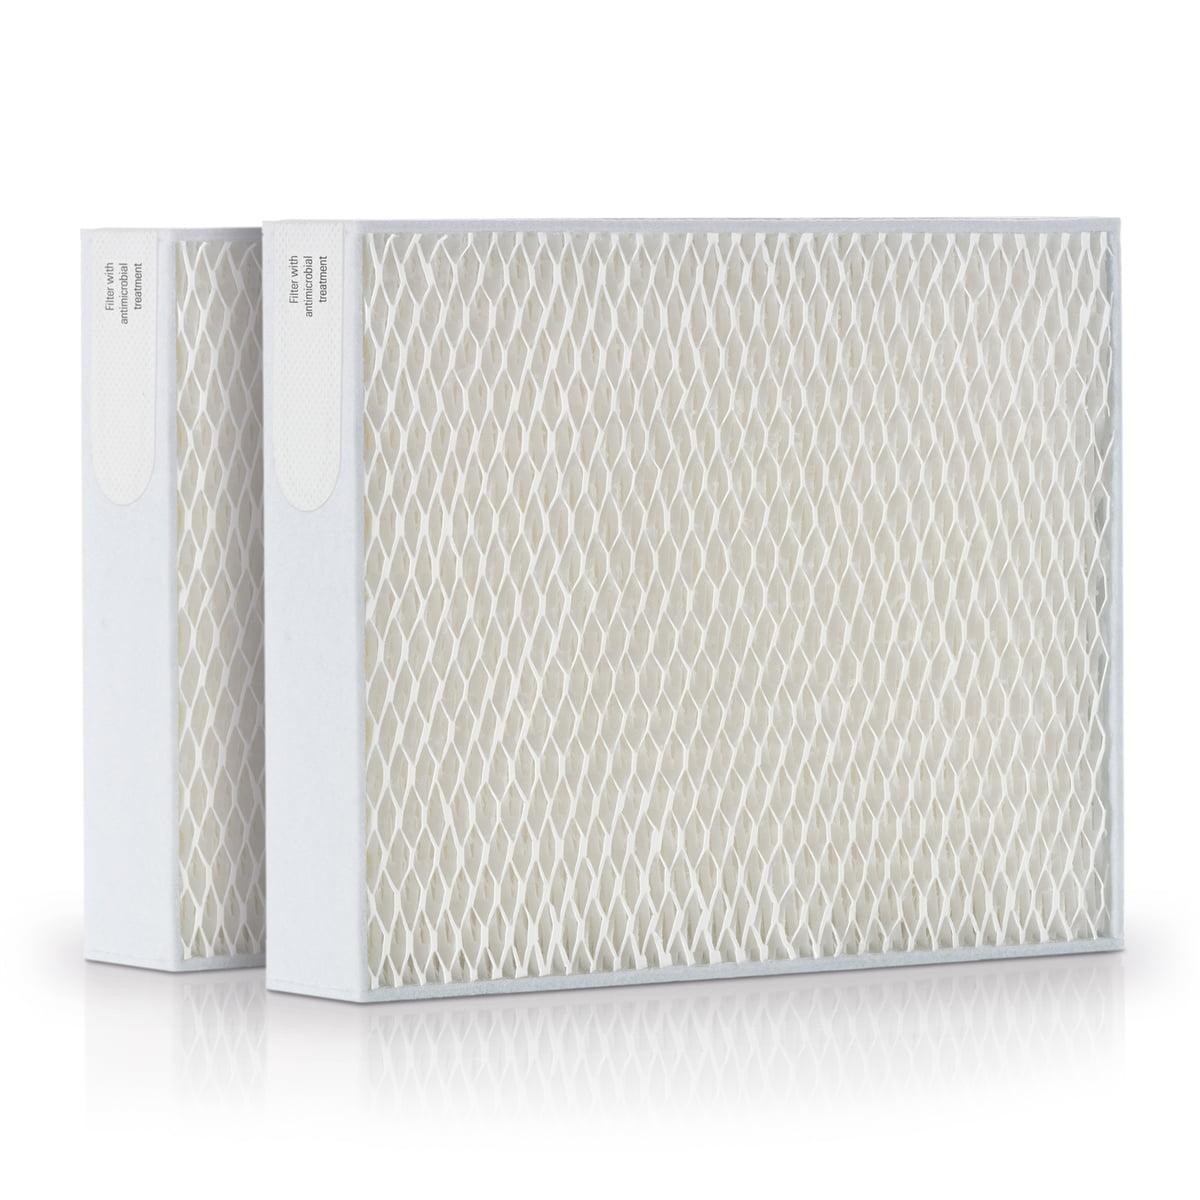 Stadler Form - Filterset für Oskar Luftbefeuchter (2er-Set) | Baumarkt > Heizung und Klima > Klimageräte | Stadler Form